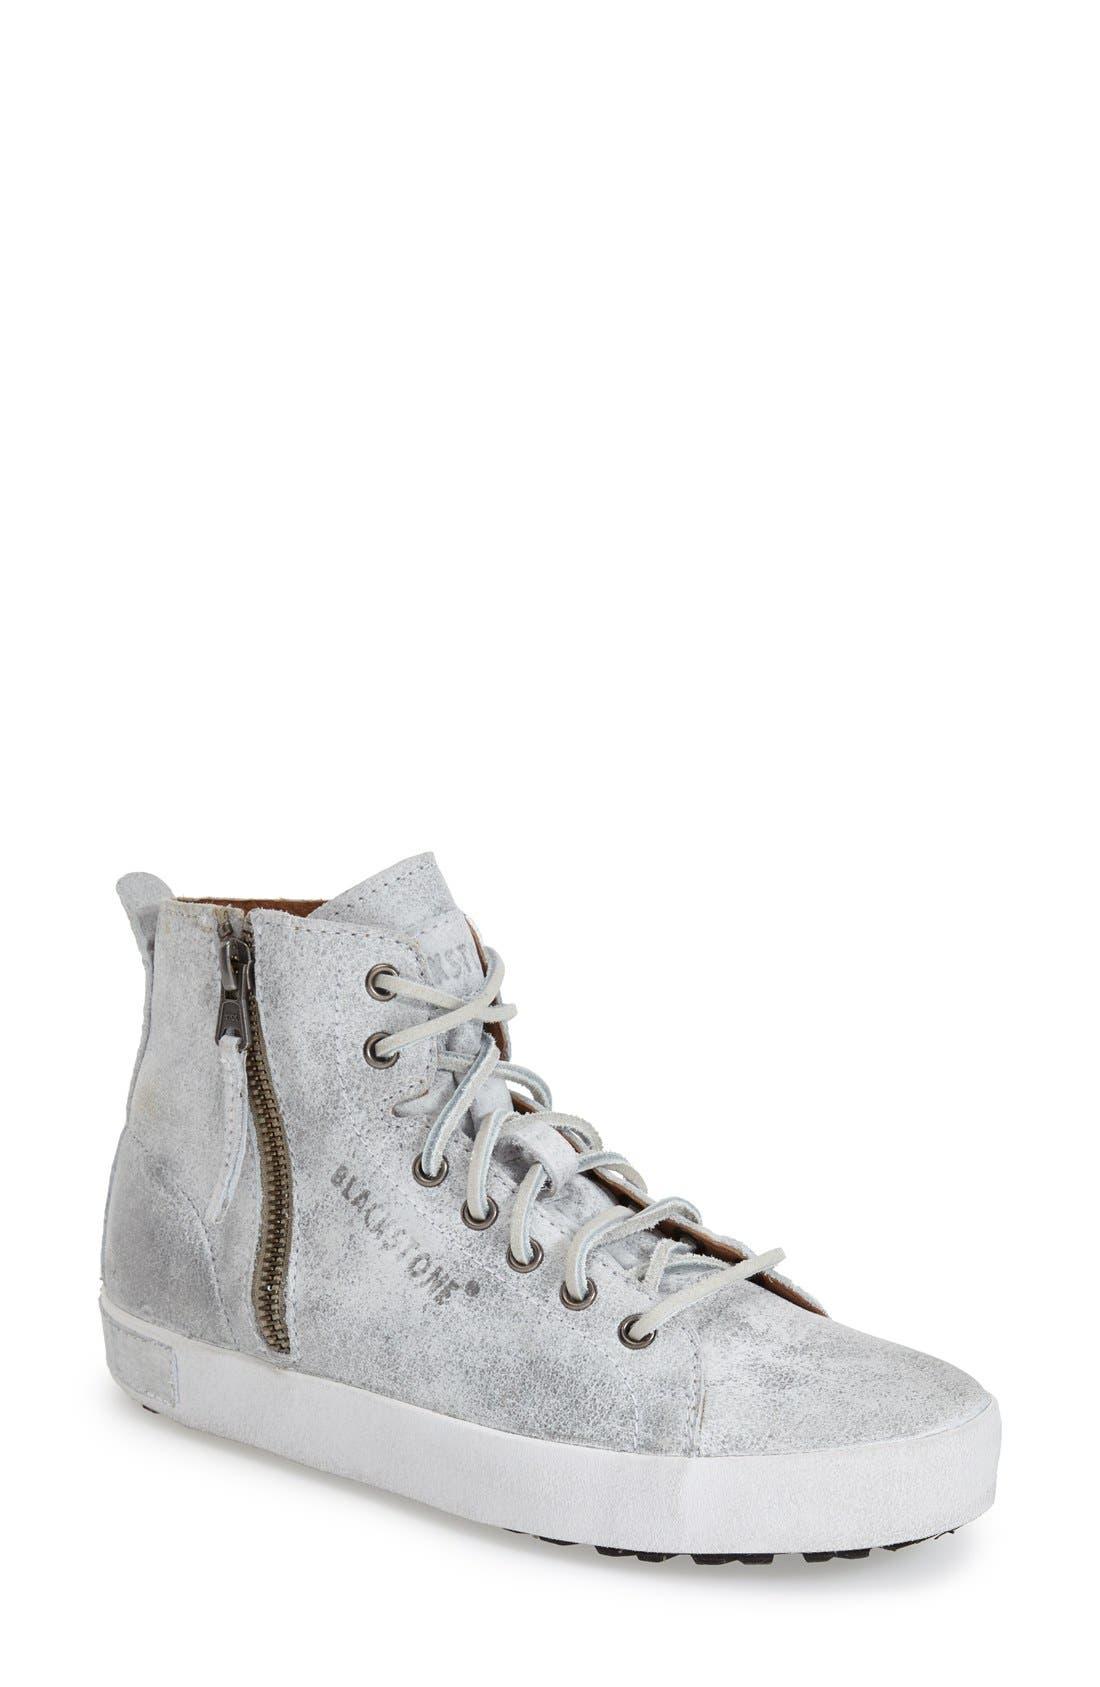 BLACKSTONE JL High Top Sneaker